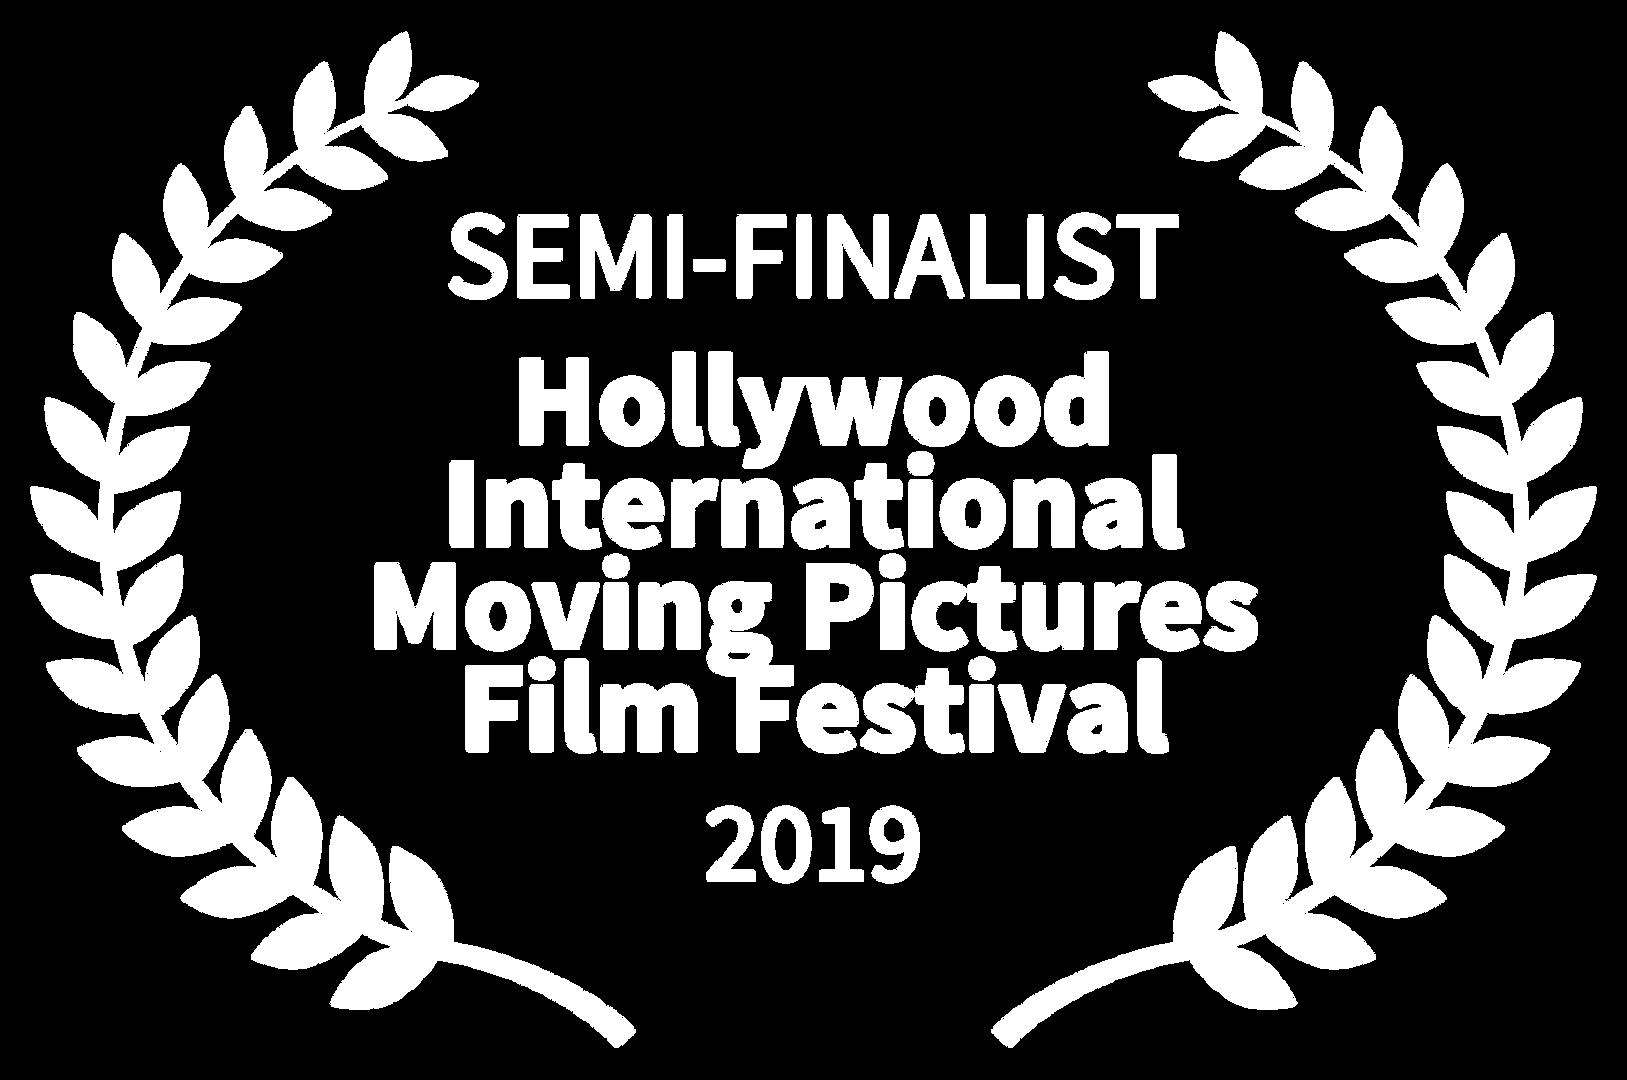 SEMI-FINALIST - Hollywood International